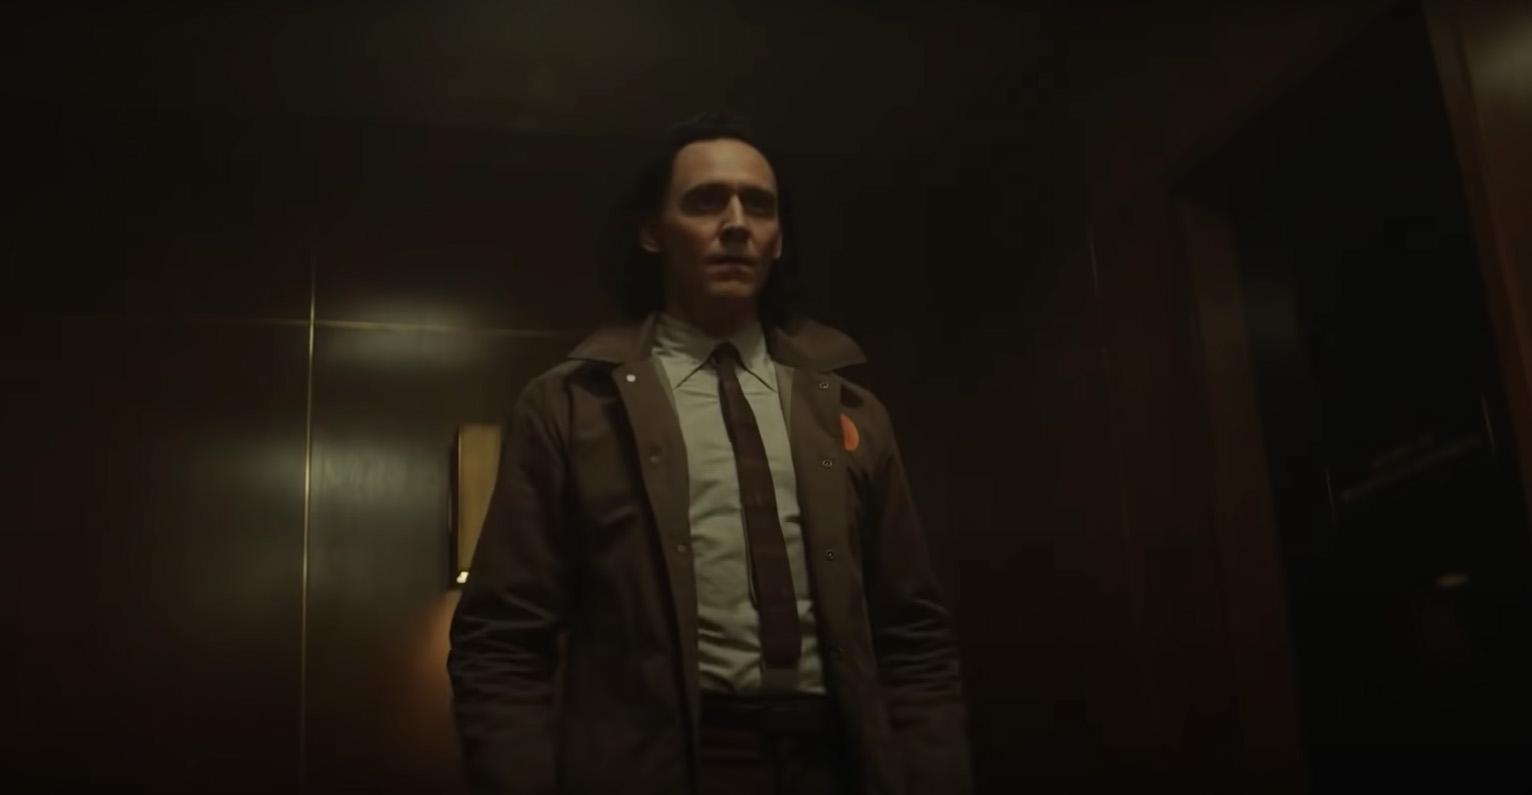 Disney+ revela la fecha de estreno de 'Loki' y 'Monsters at Work'